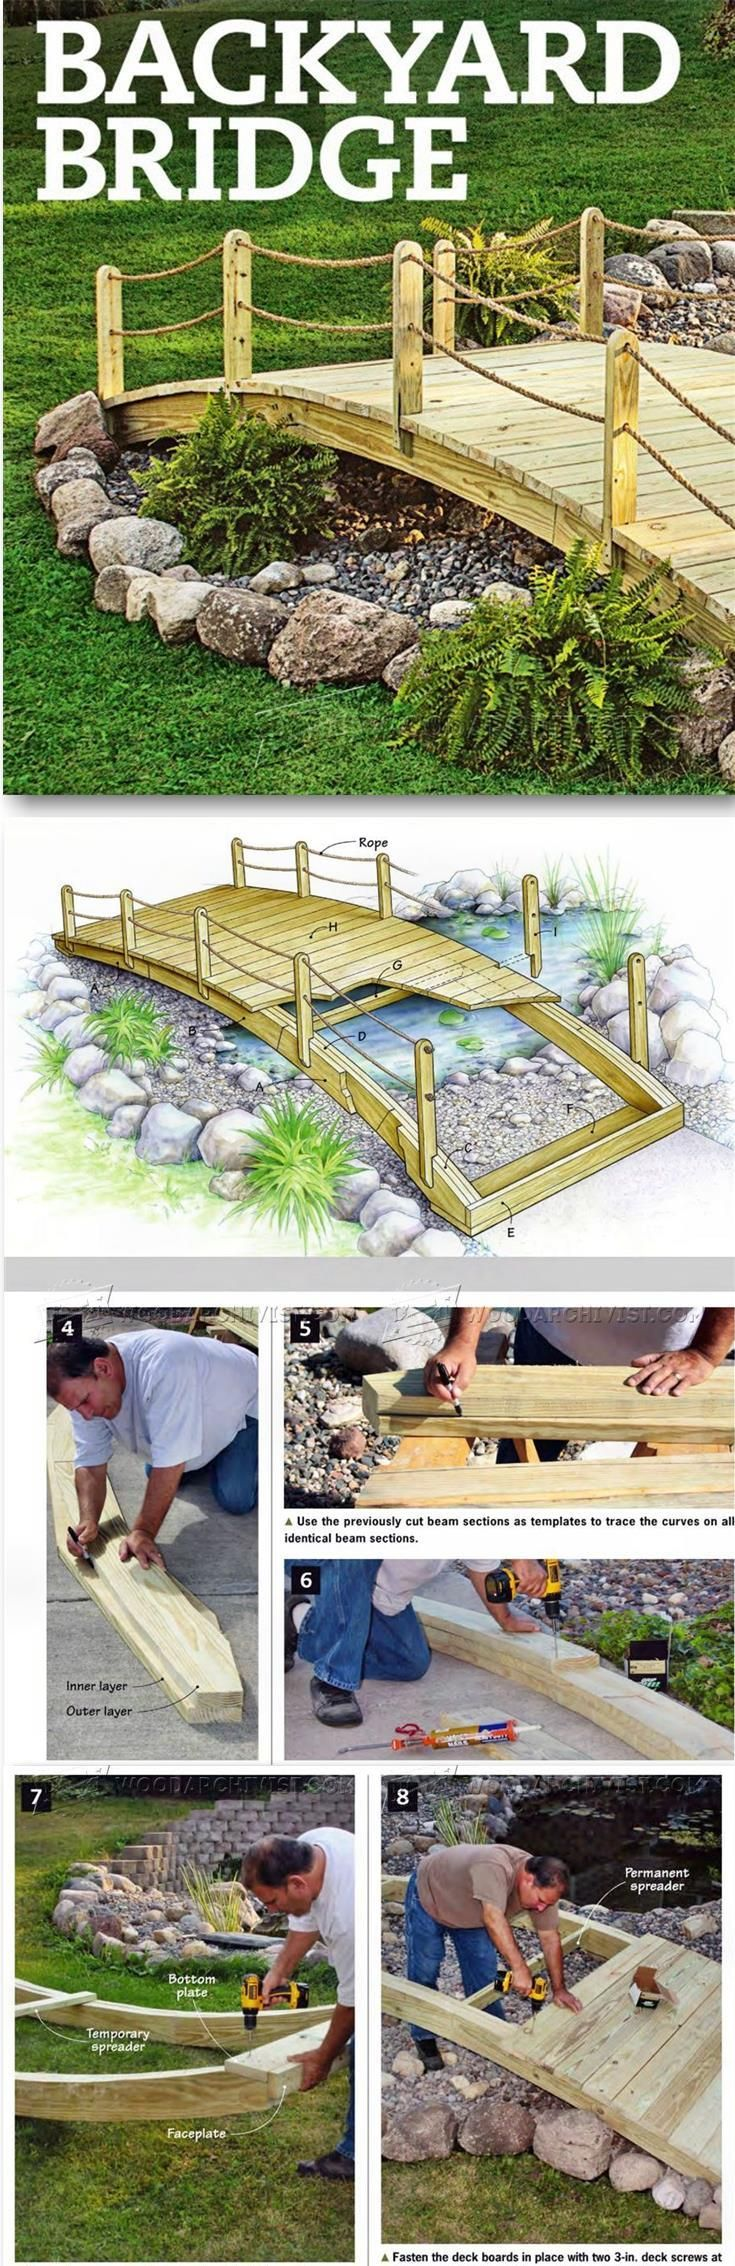 backyard bridge plans outdoor plans and projects woodarchivist